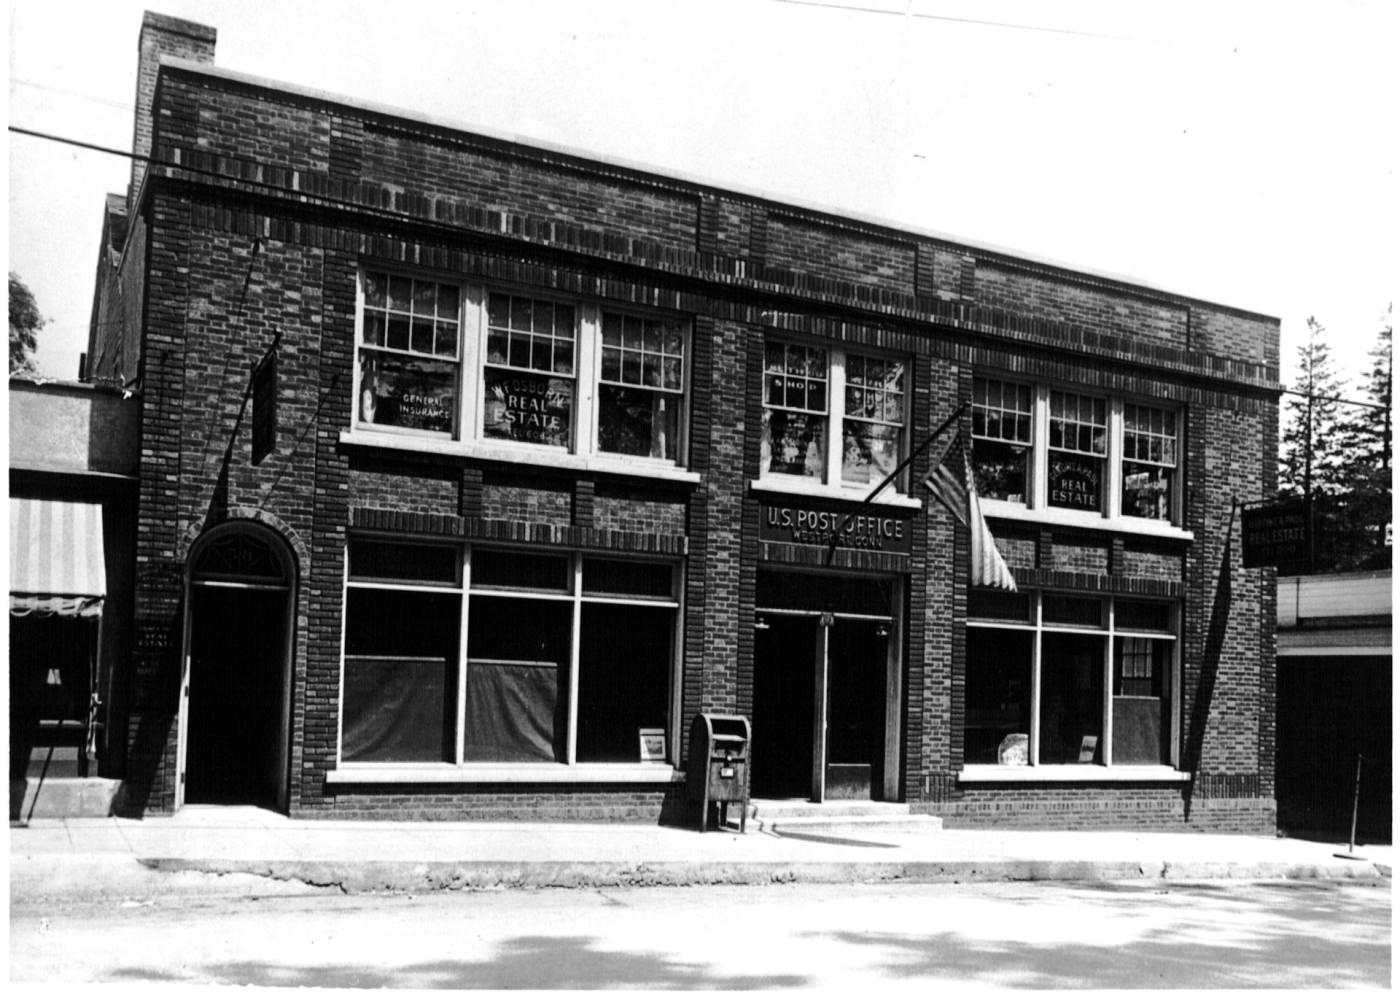 1930s-old-post-office1.jpg